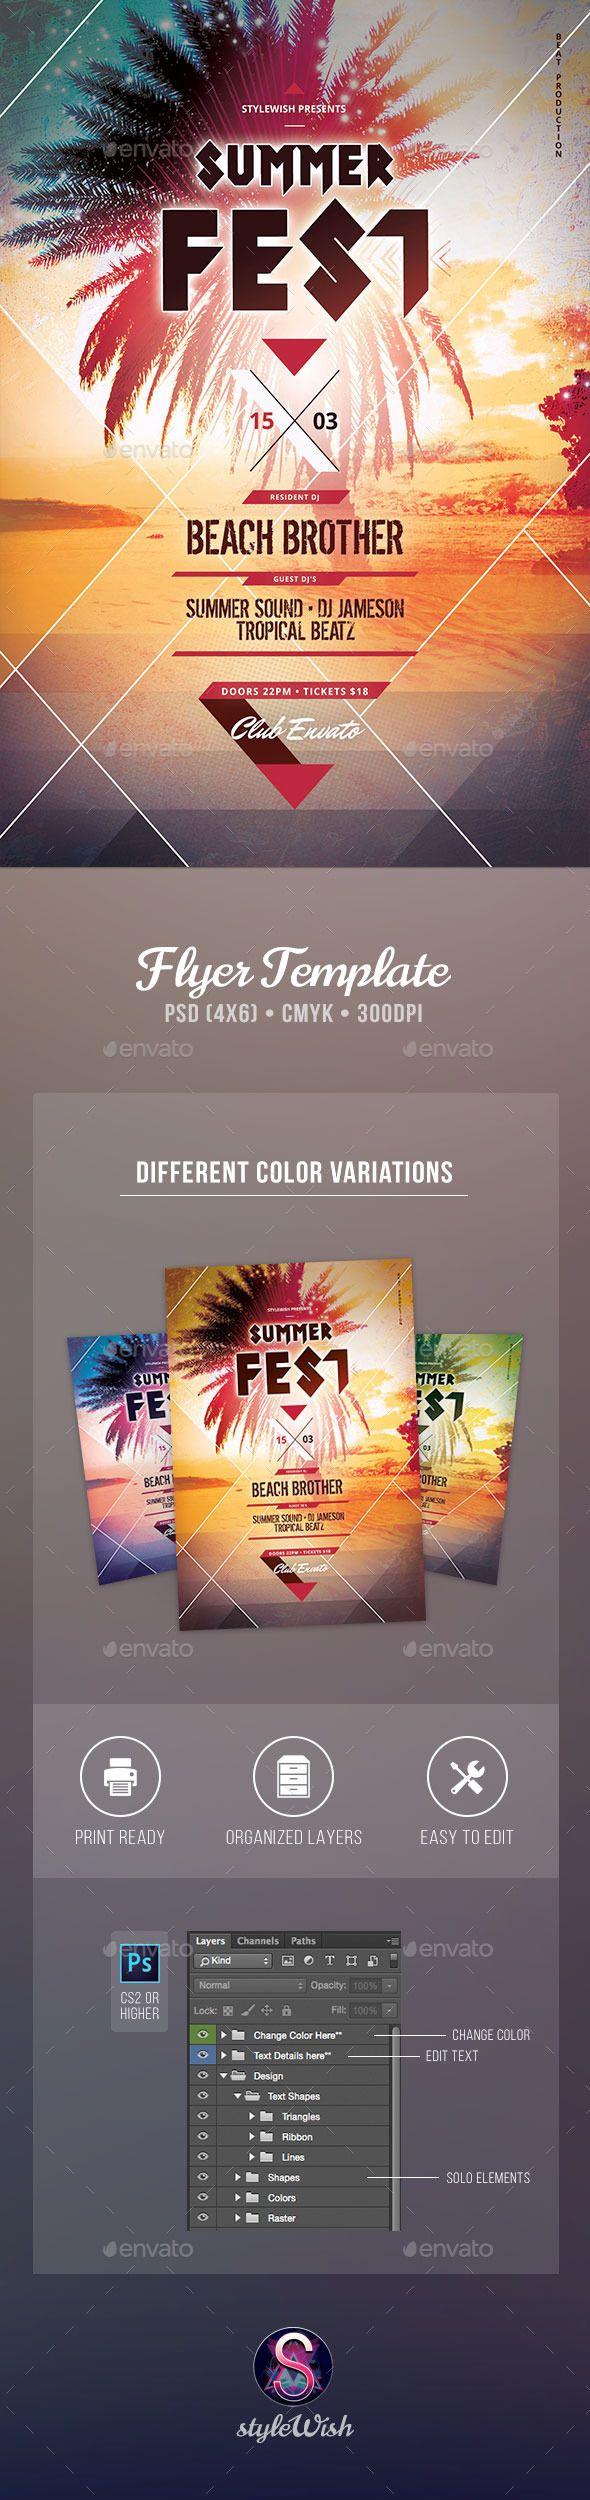 Summer Fest Flyer Tempalte #design Download: http://graphicriver.net/item/summer-fest-flyer/11210221?ref=ksioks